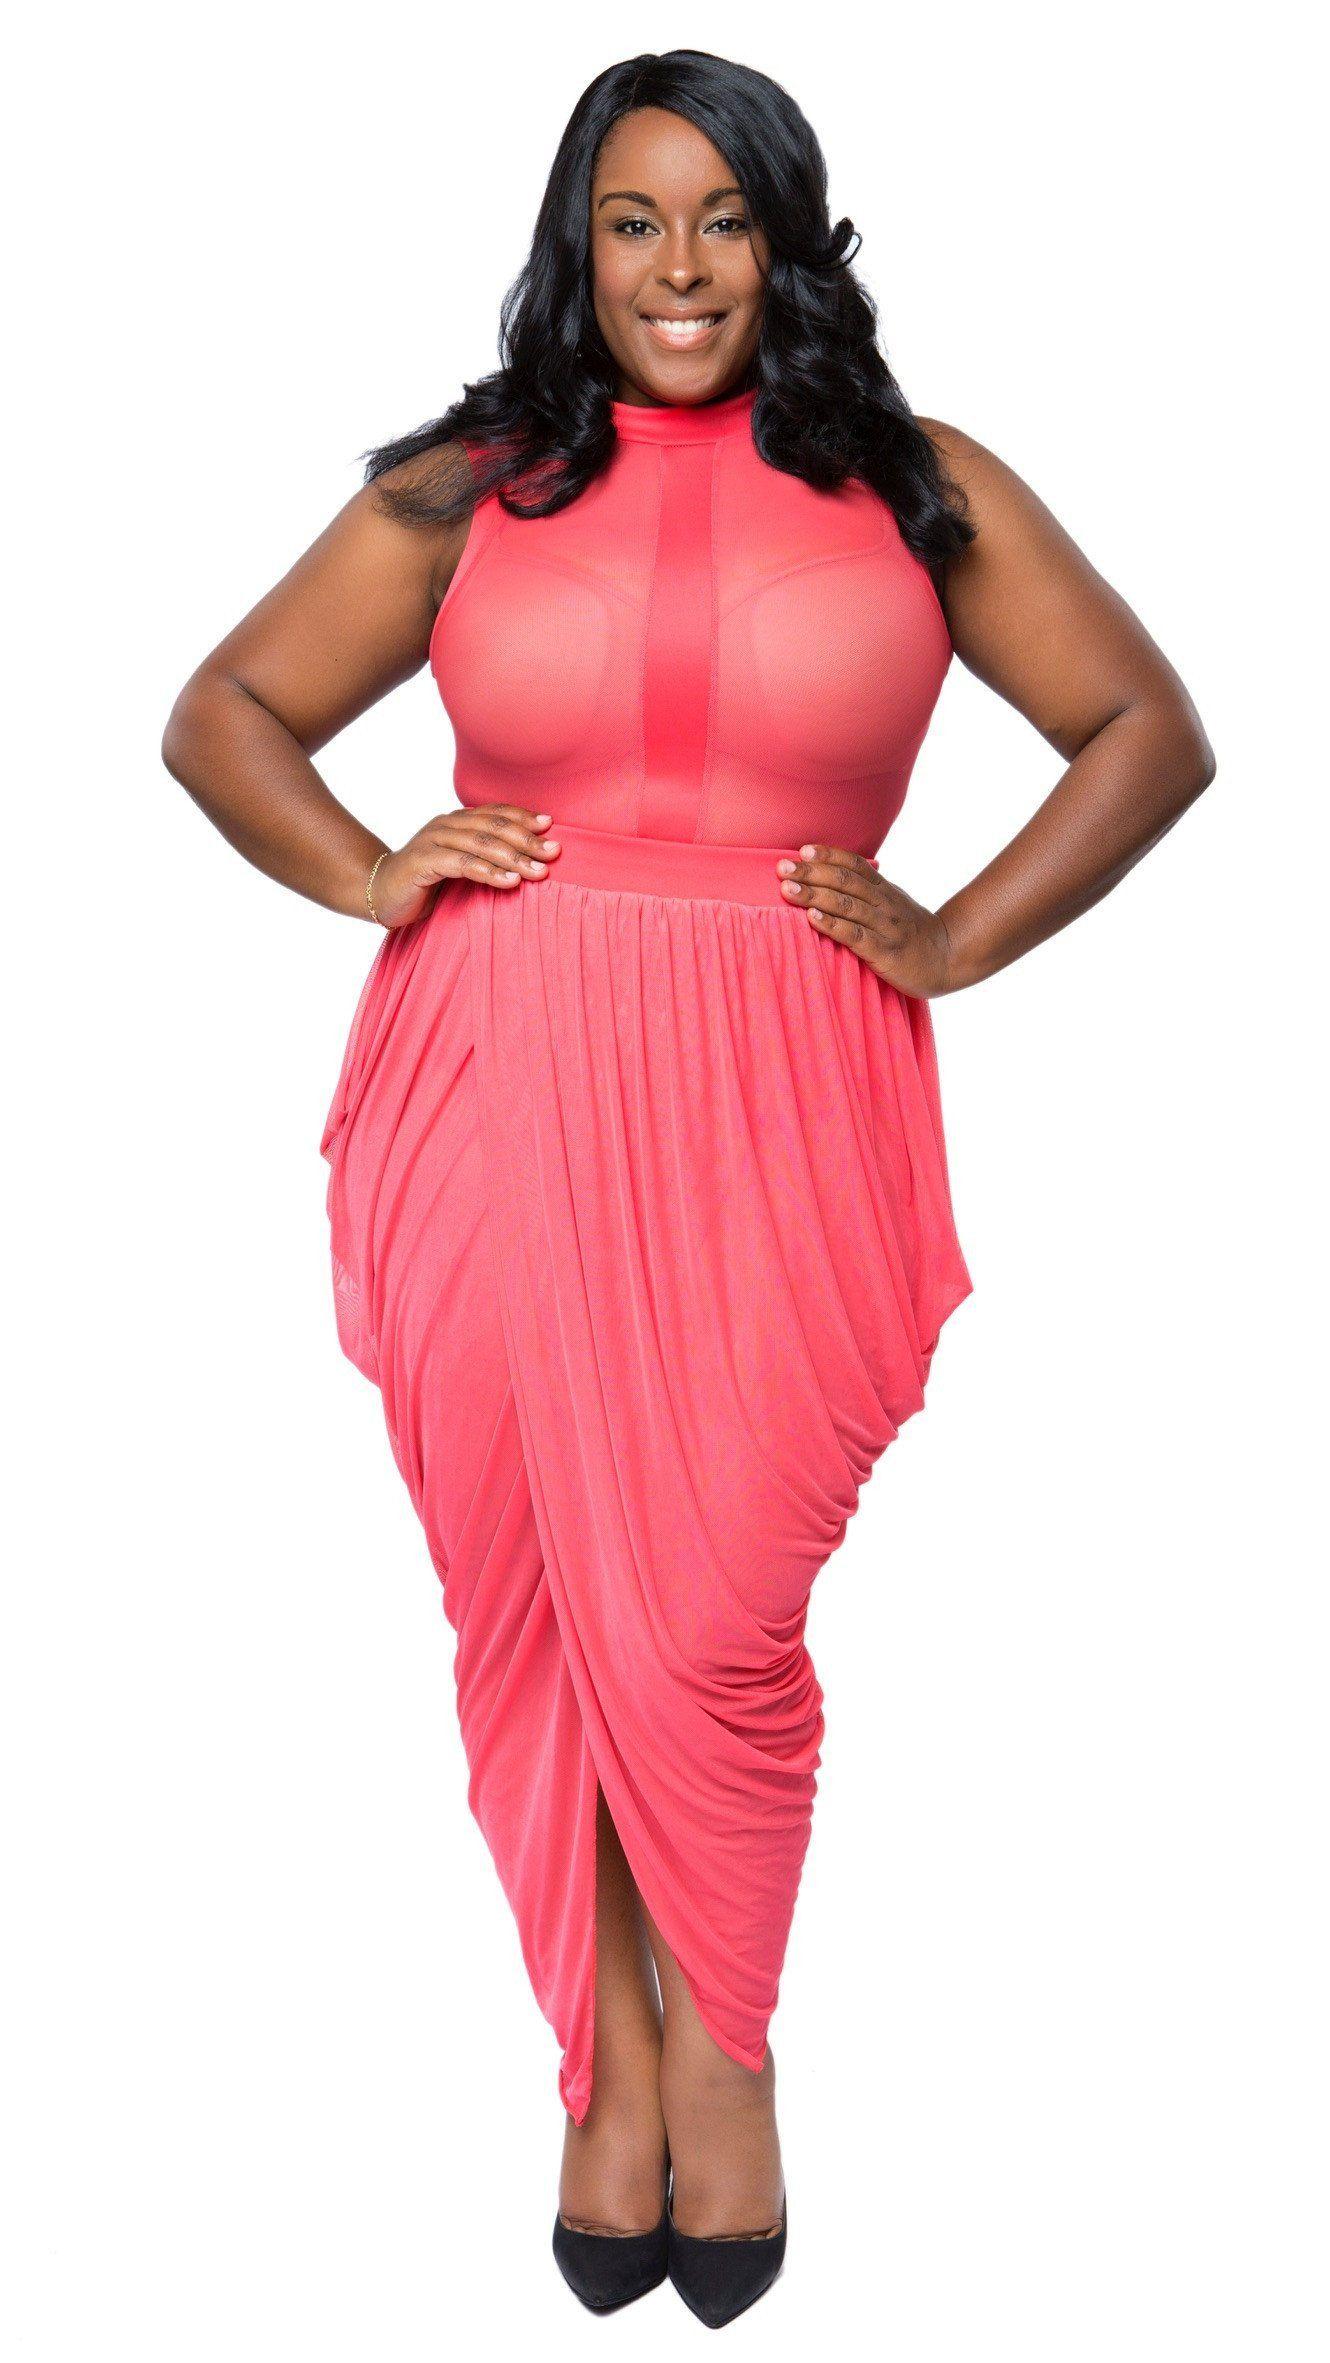 2a4eee107ccd6 Sheer Sensation 2Pcs Skirt Set (Coral)   Things to Wear   Skirt set ...